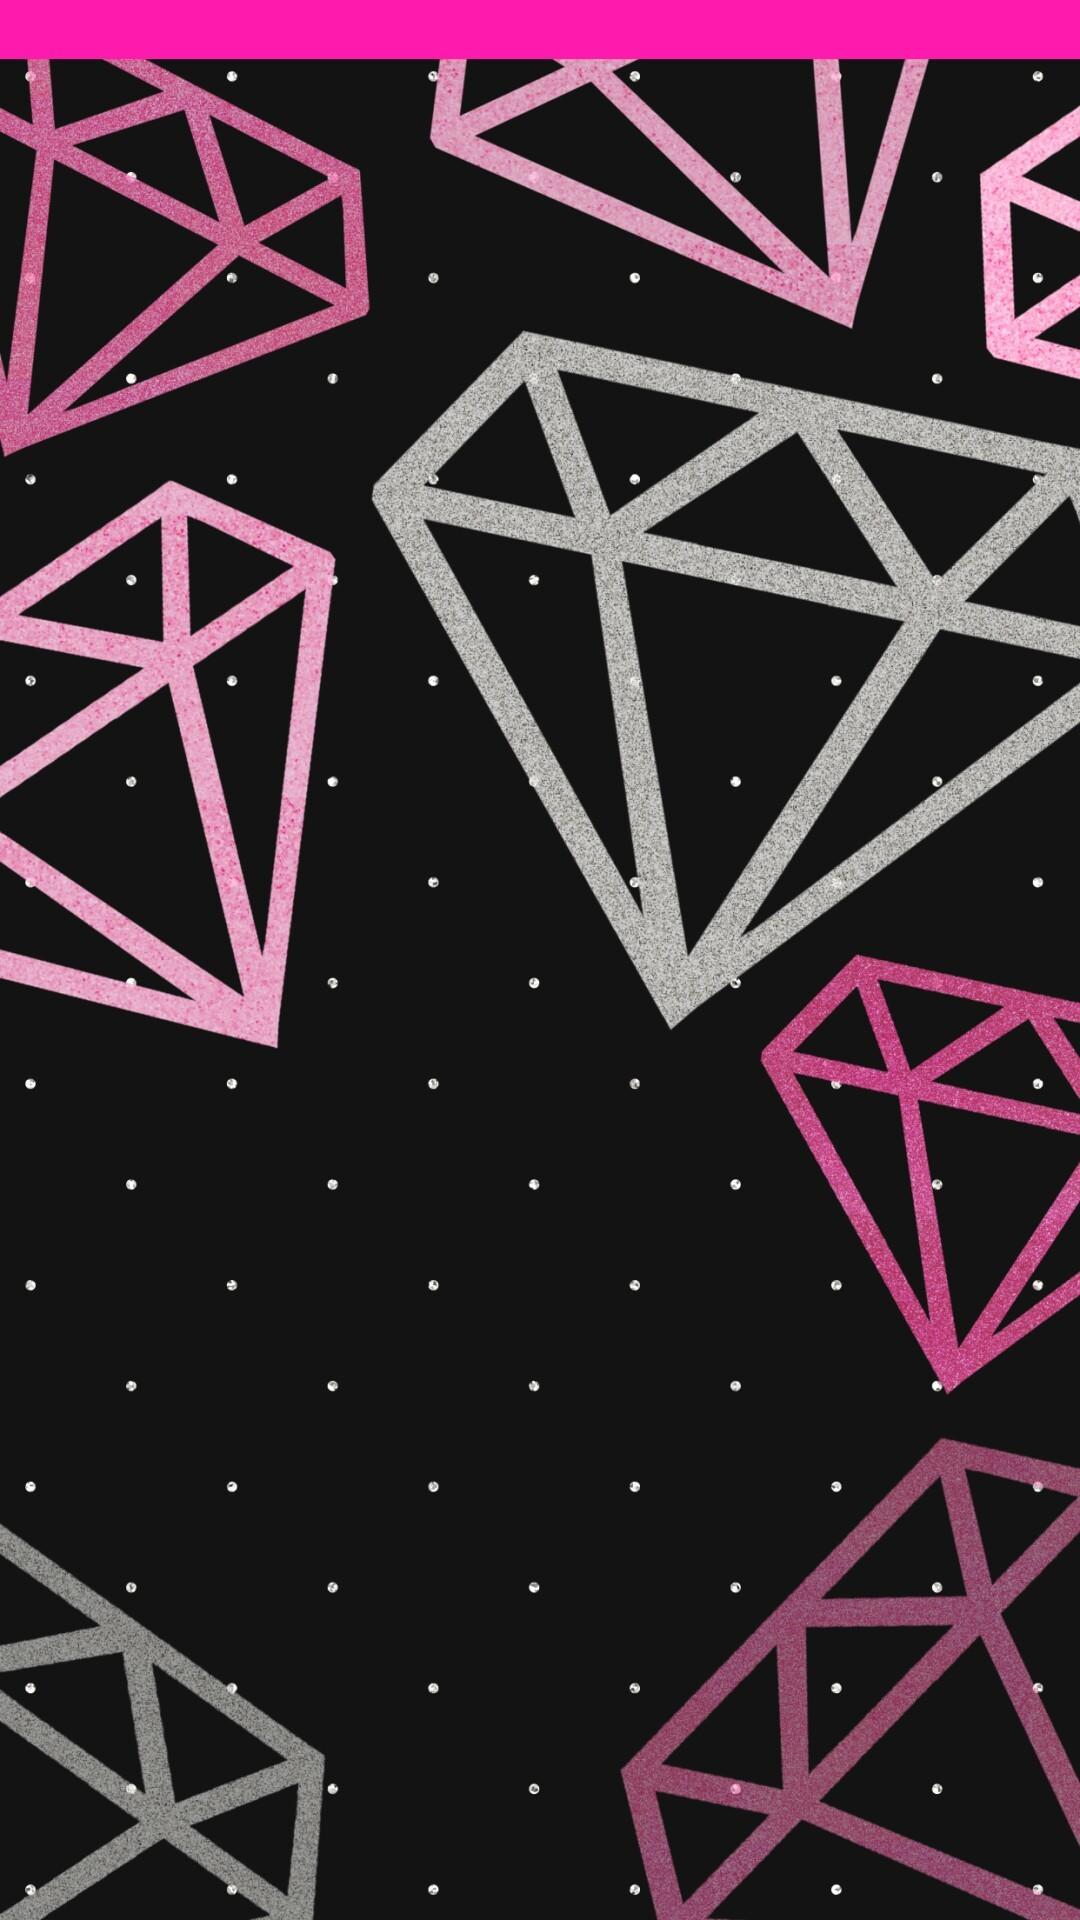 pinklifealways.tumblr.com · Diamond WallpaperKawaii WallpaperPink …